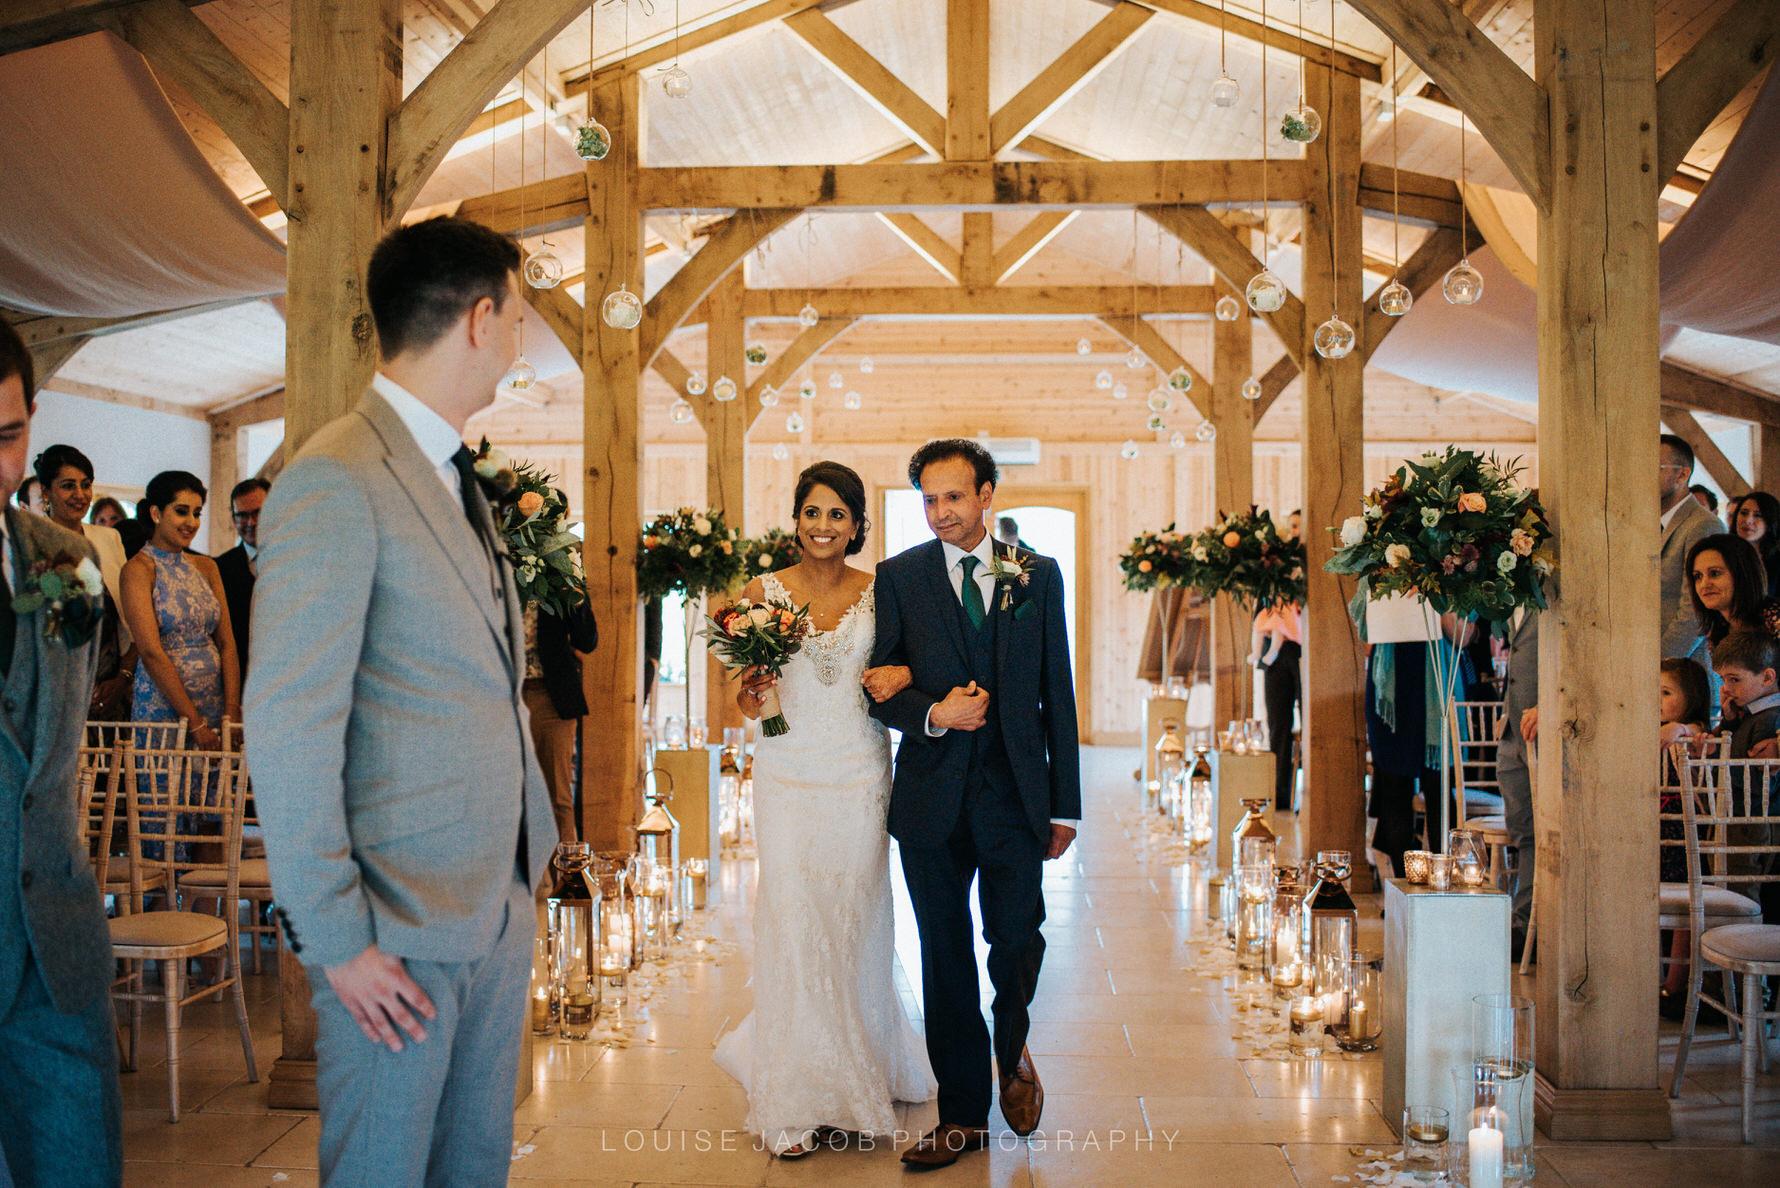 Cheshire Wedding Photography at Colshaw HallCheshire Wedding Photography at Colshaw Hall